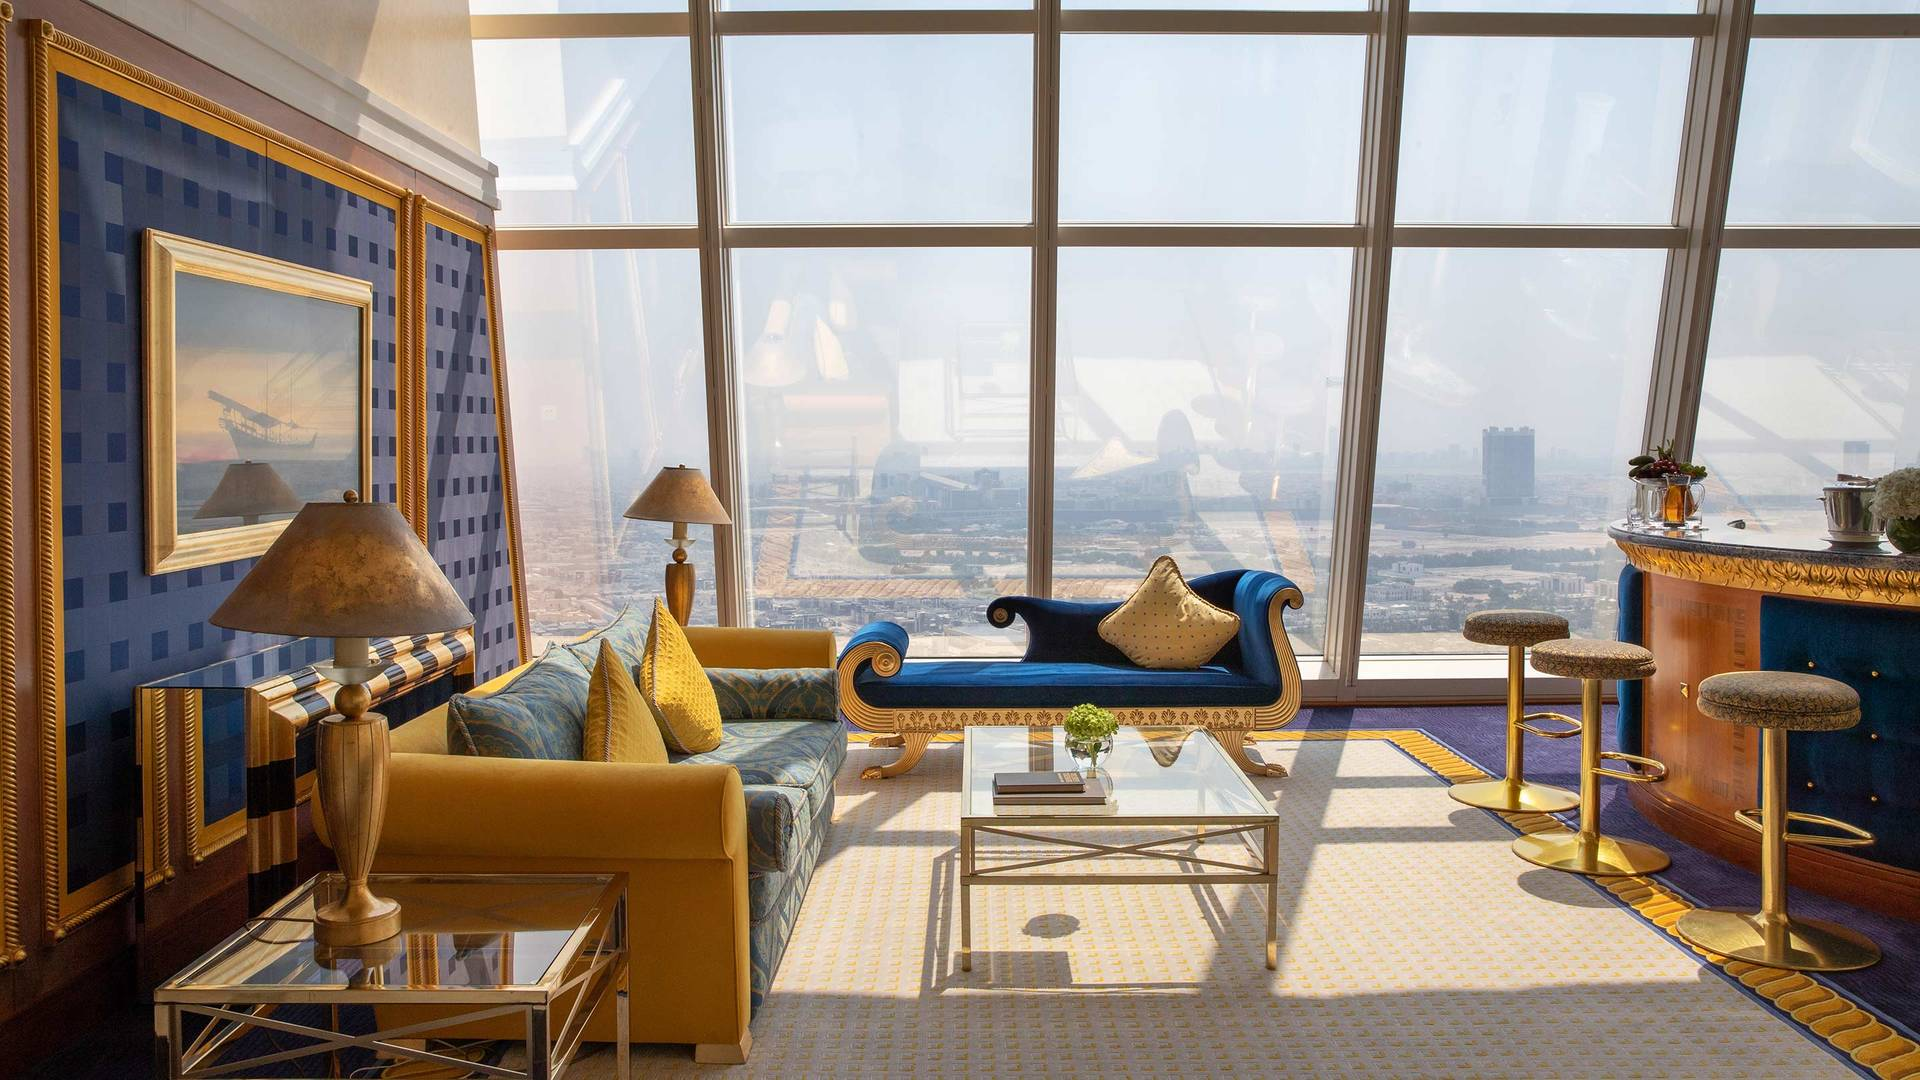 Jumeirah Burj Al Arab Club Suite Living room with city view